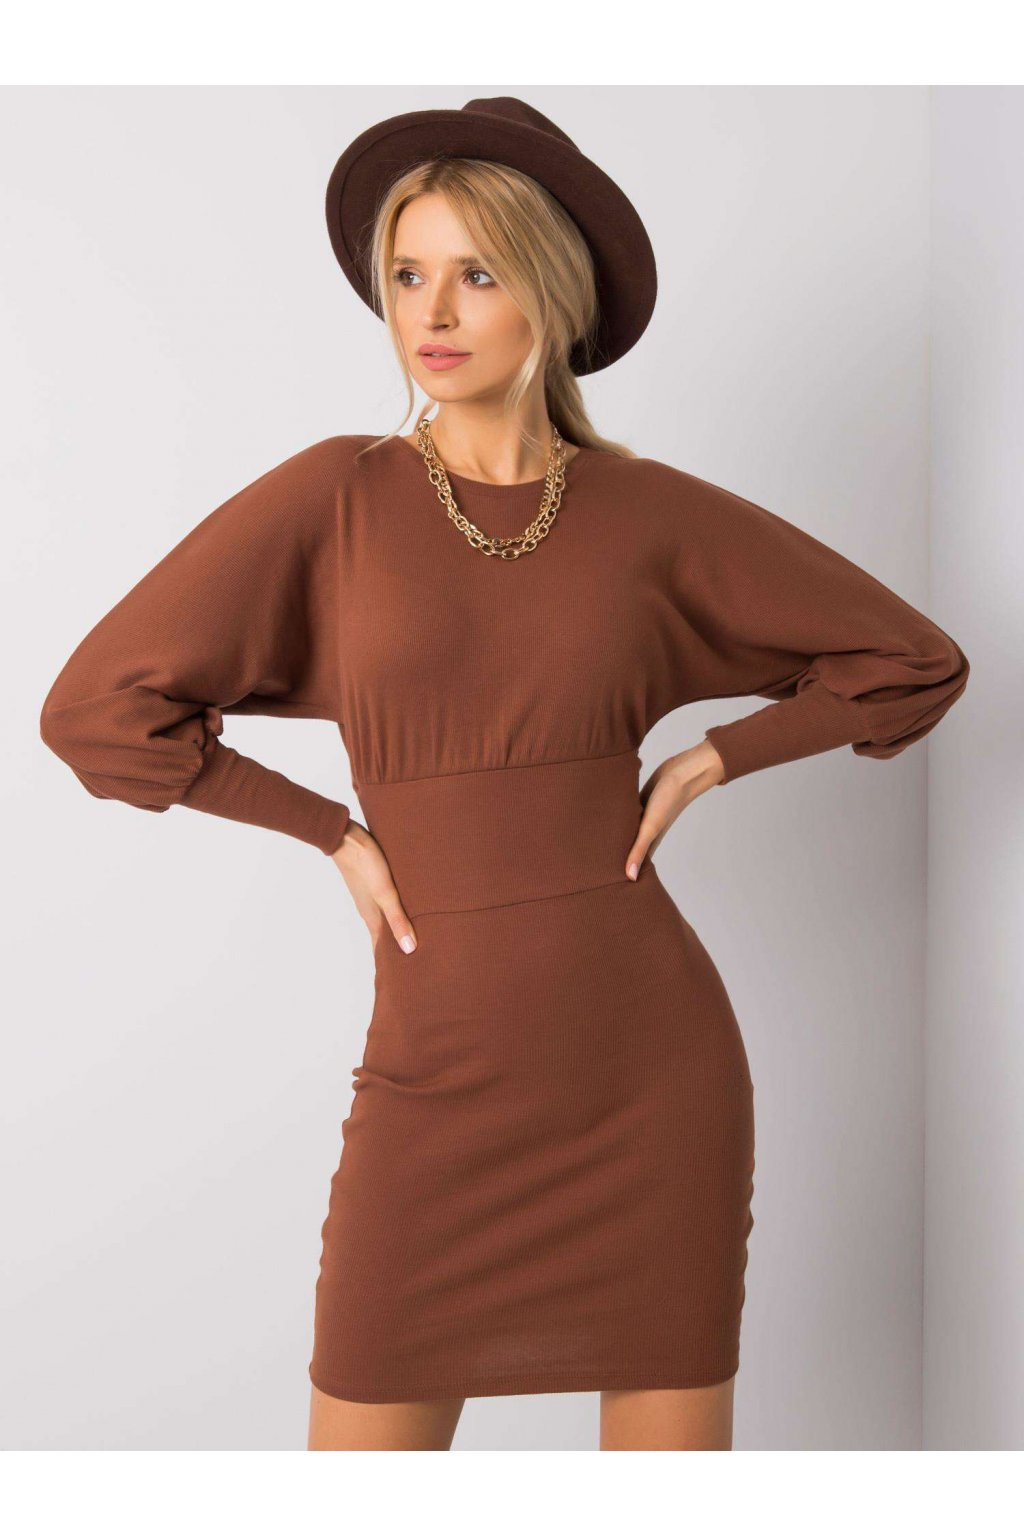 pol pl Brazowa sukienka Leticia RUE PARIS 358297 2